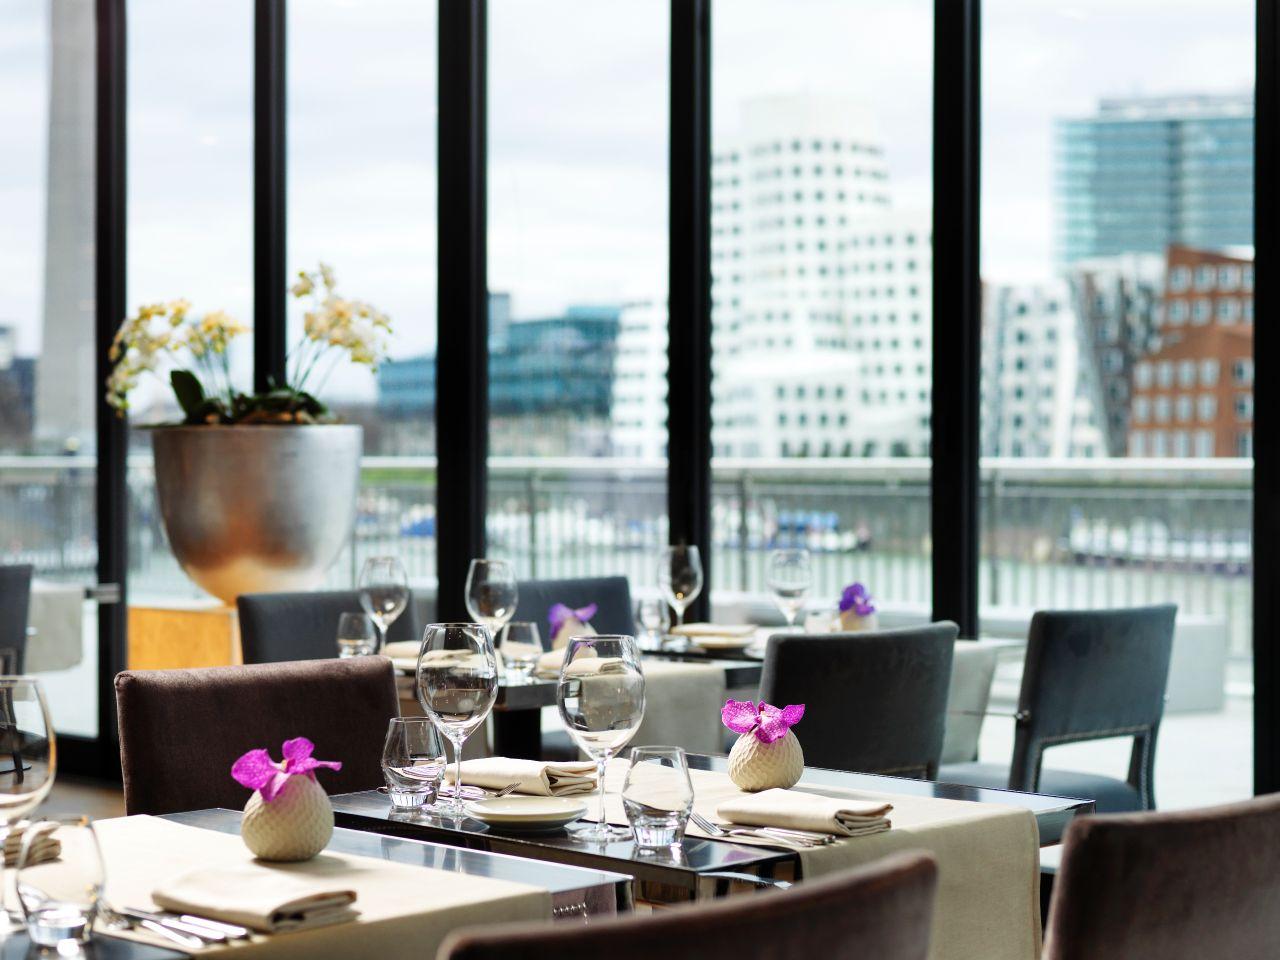 Dusseldorf Restaurants L Dox Restaurant Bar Cafe D Pebble S